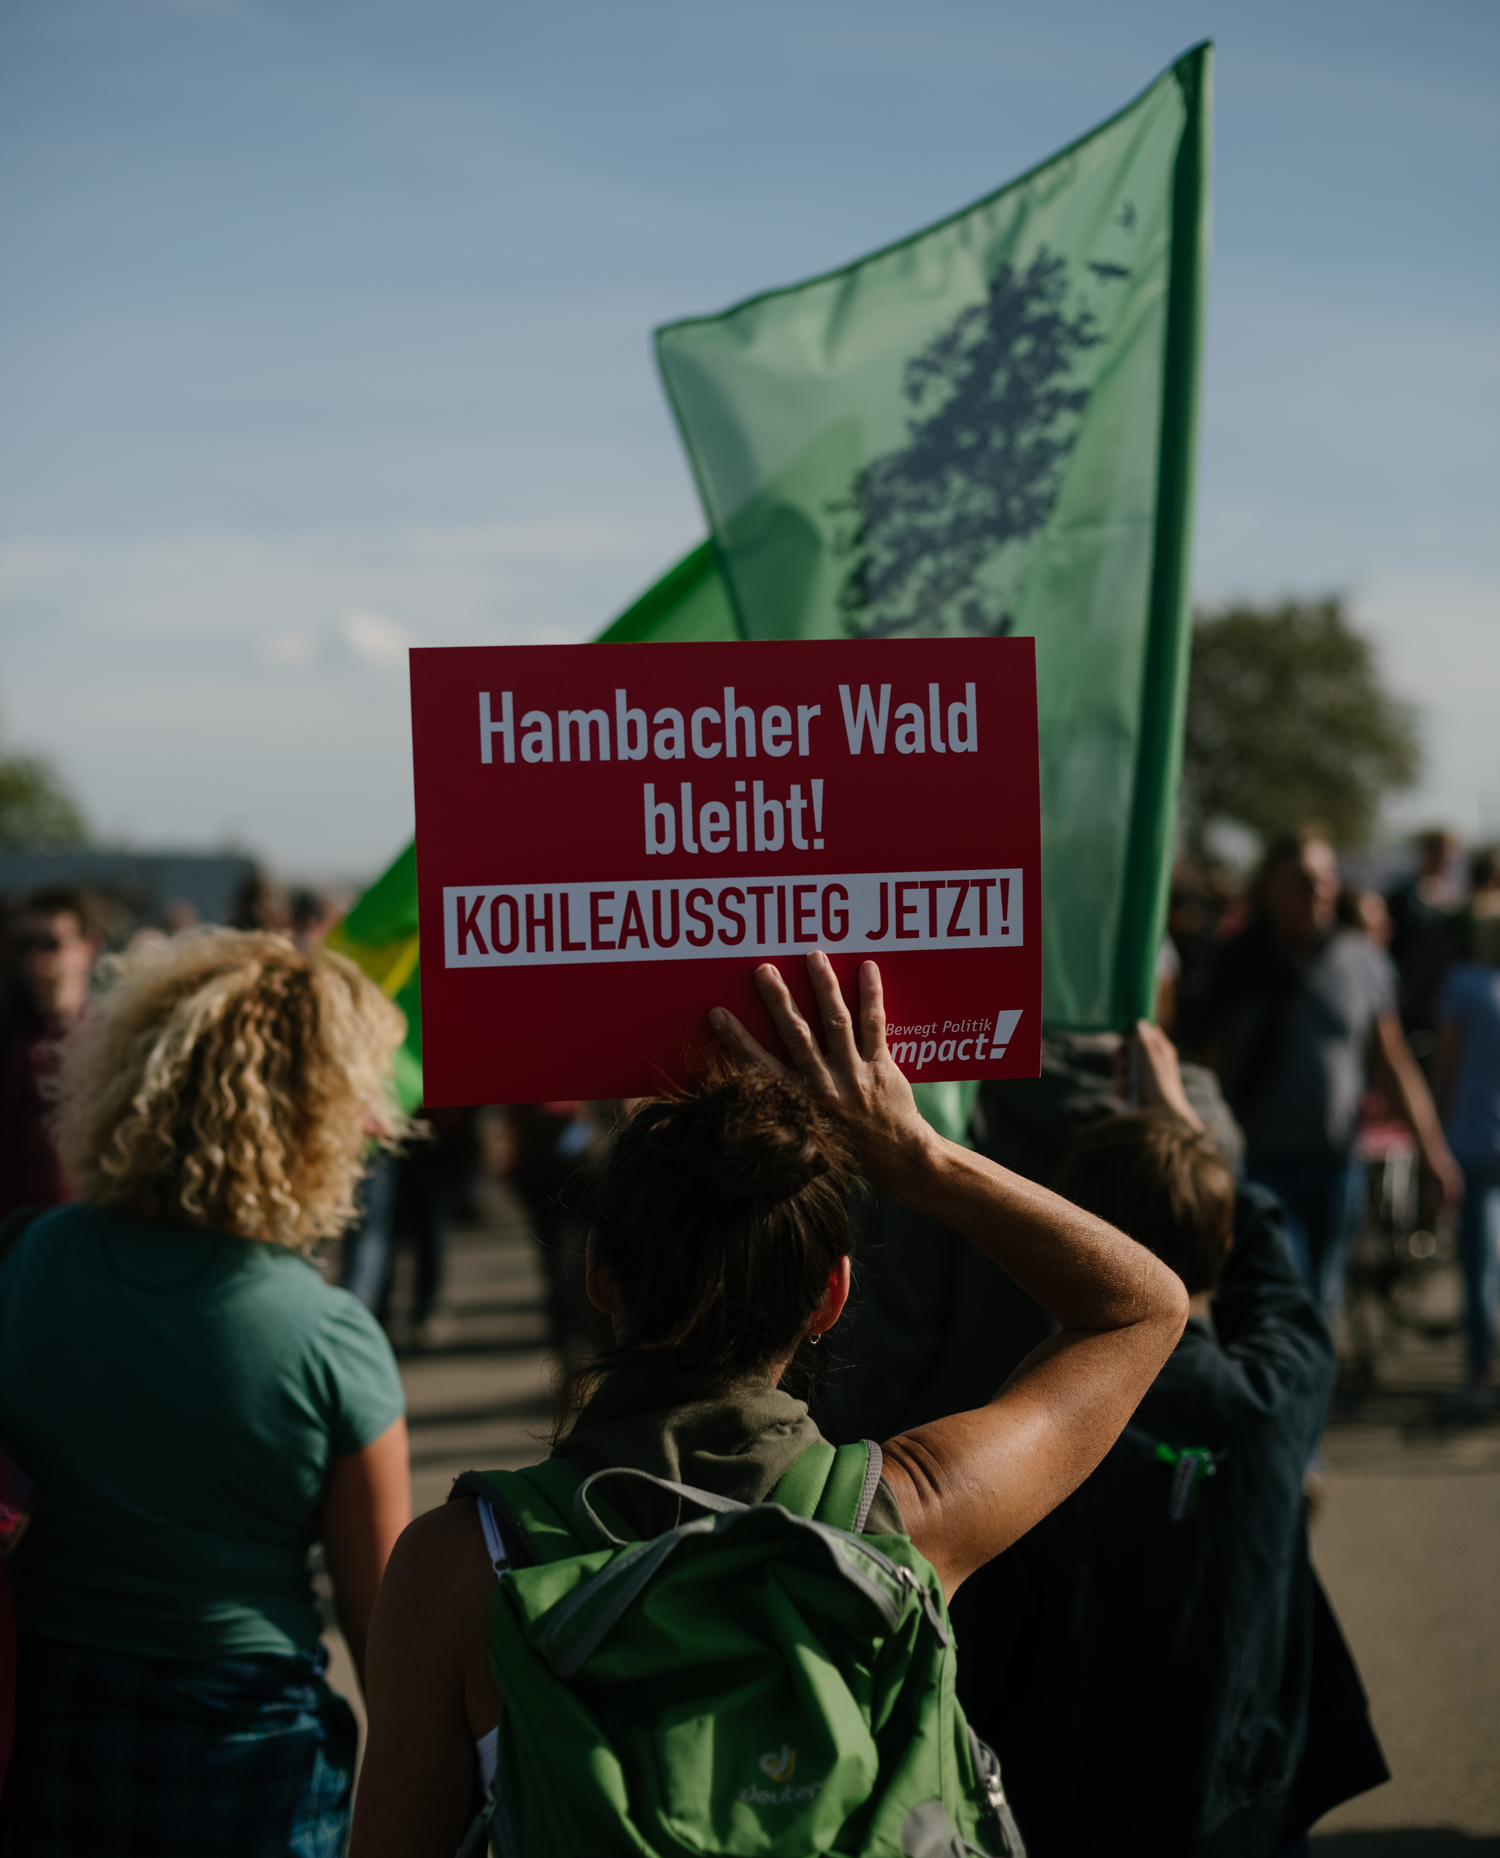 sized-ecosia-hambach-forest-germany-coal-rwe-19